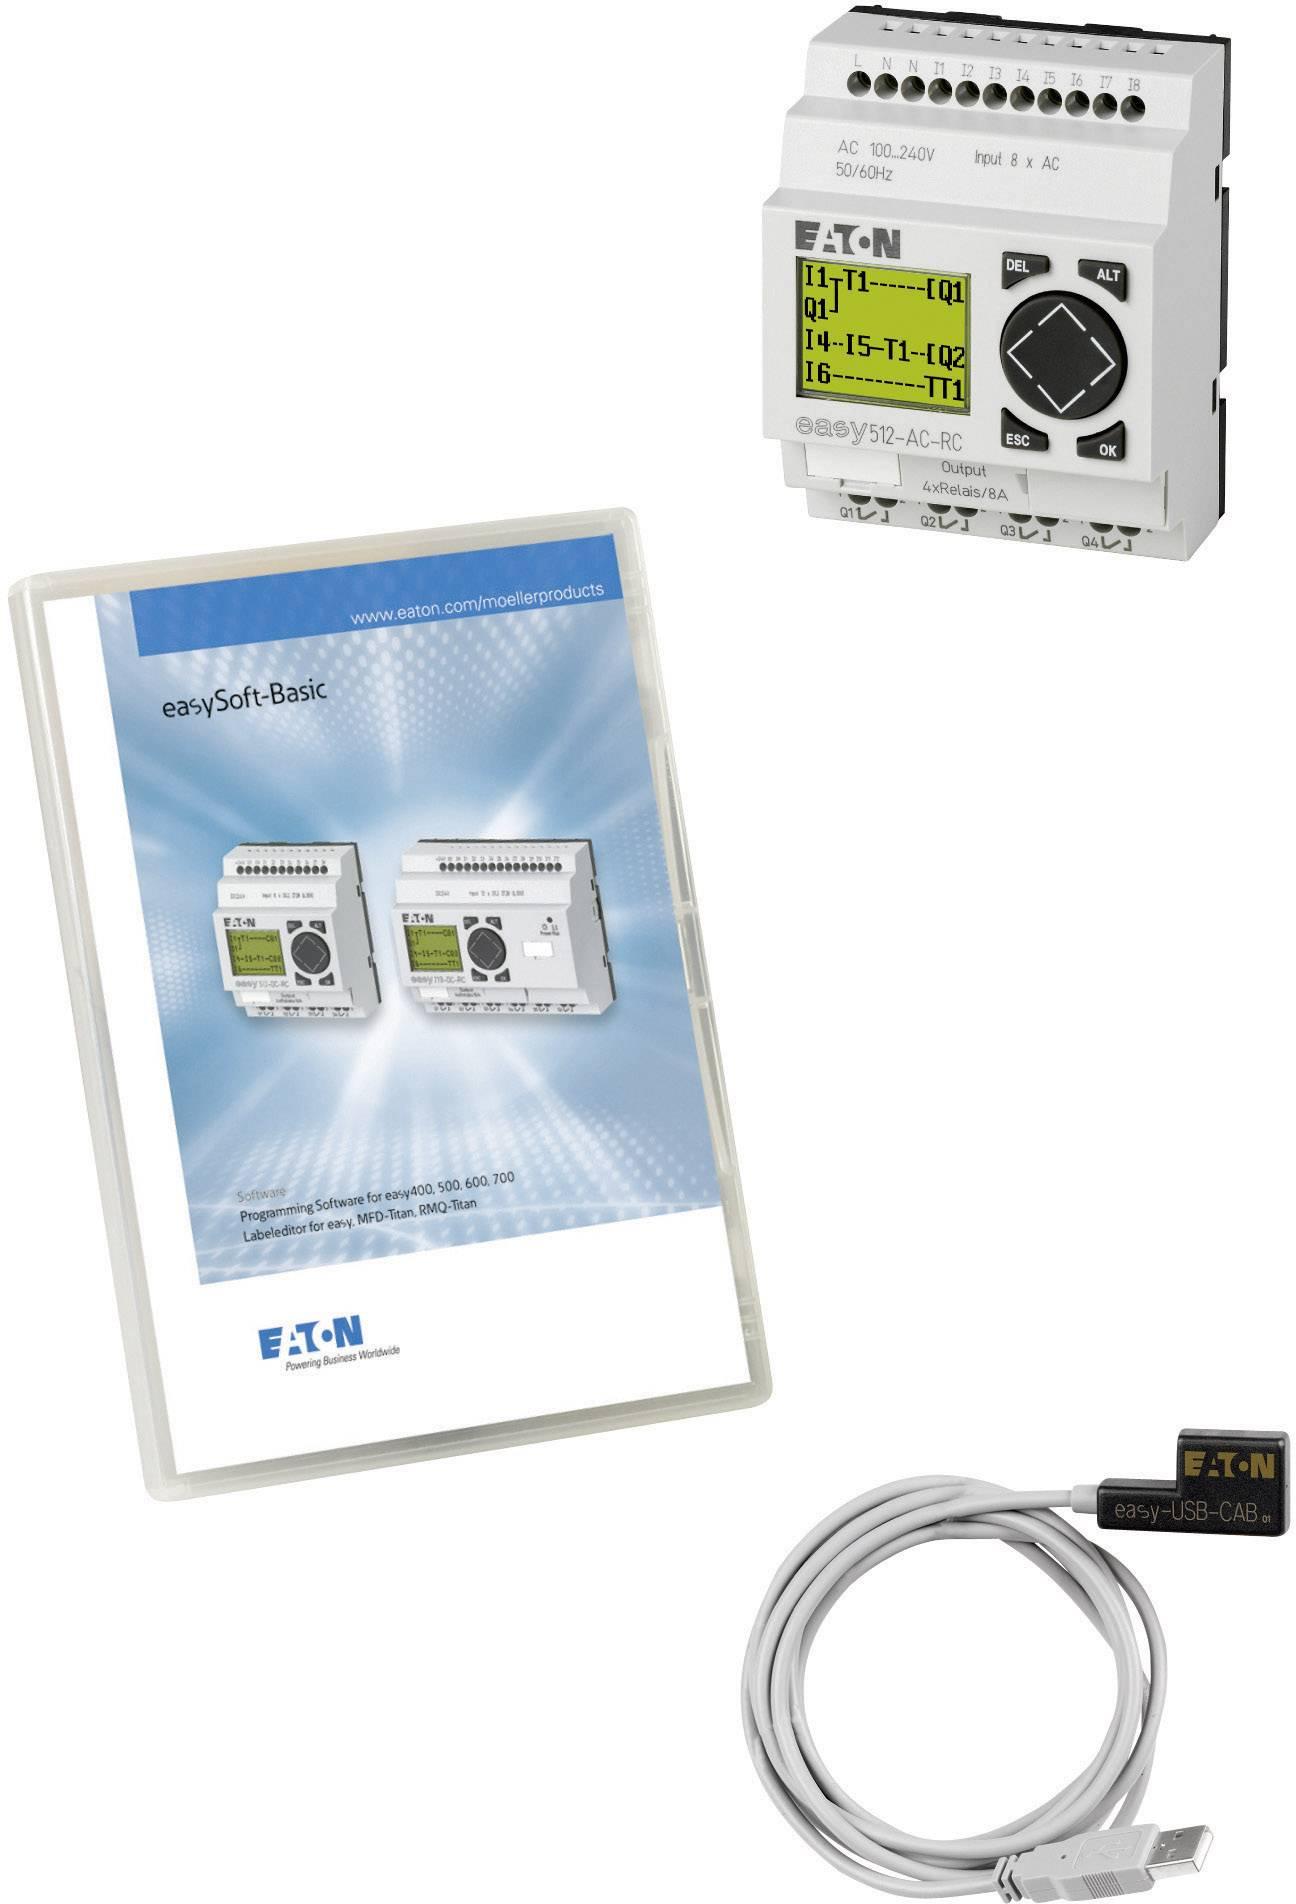 Štartovacia súprava Eaton easy-MINI-Box-USB DC 116563, 24 V/DC